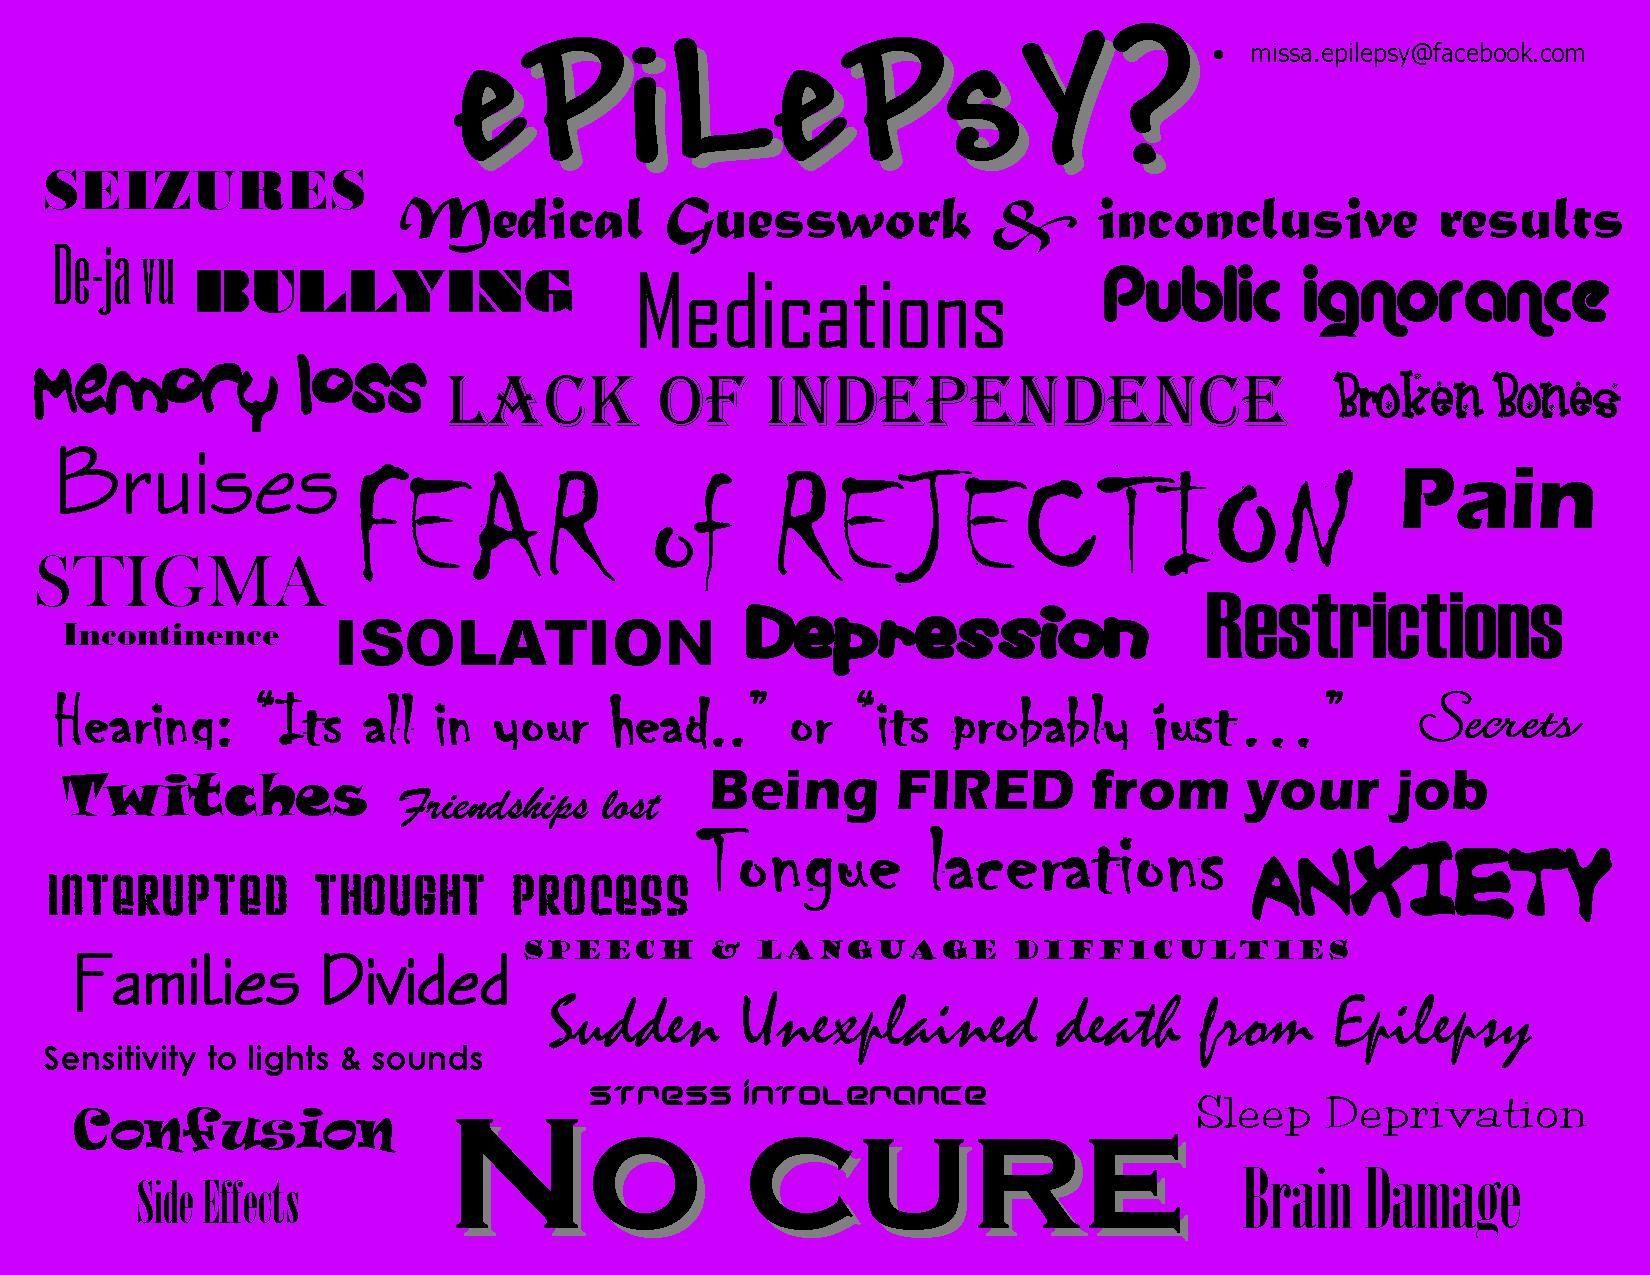 Epilepsy Awareness Quotes. QuotesGram